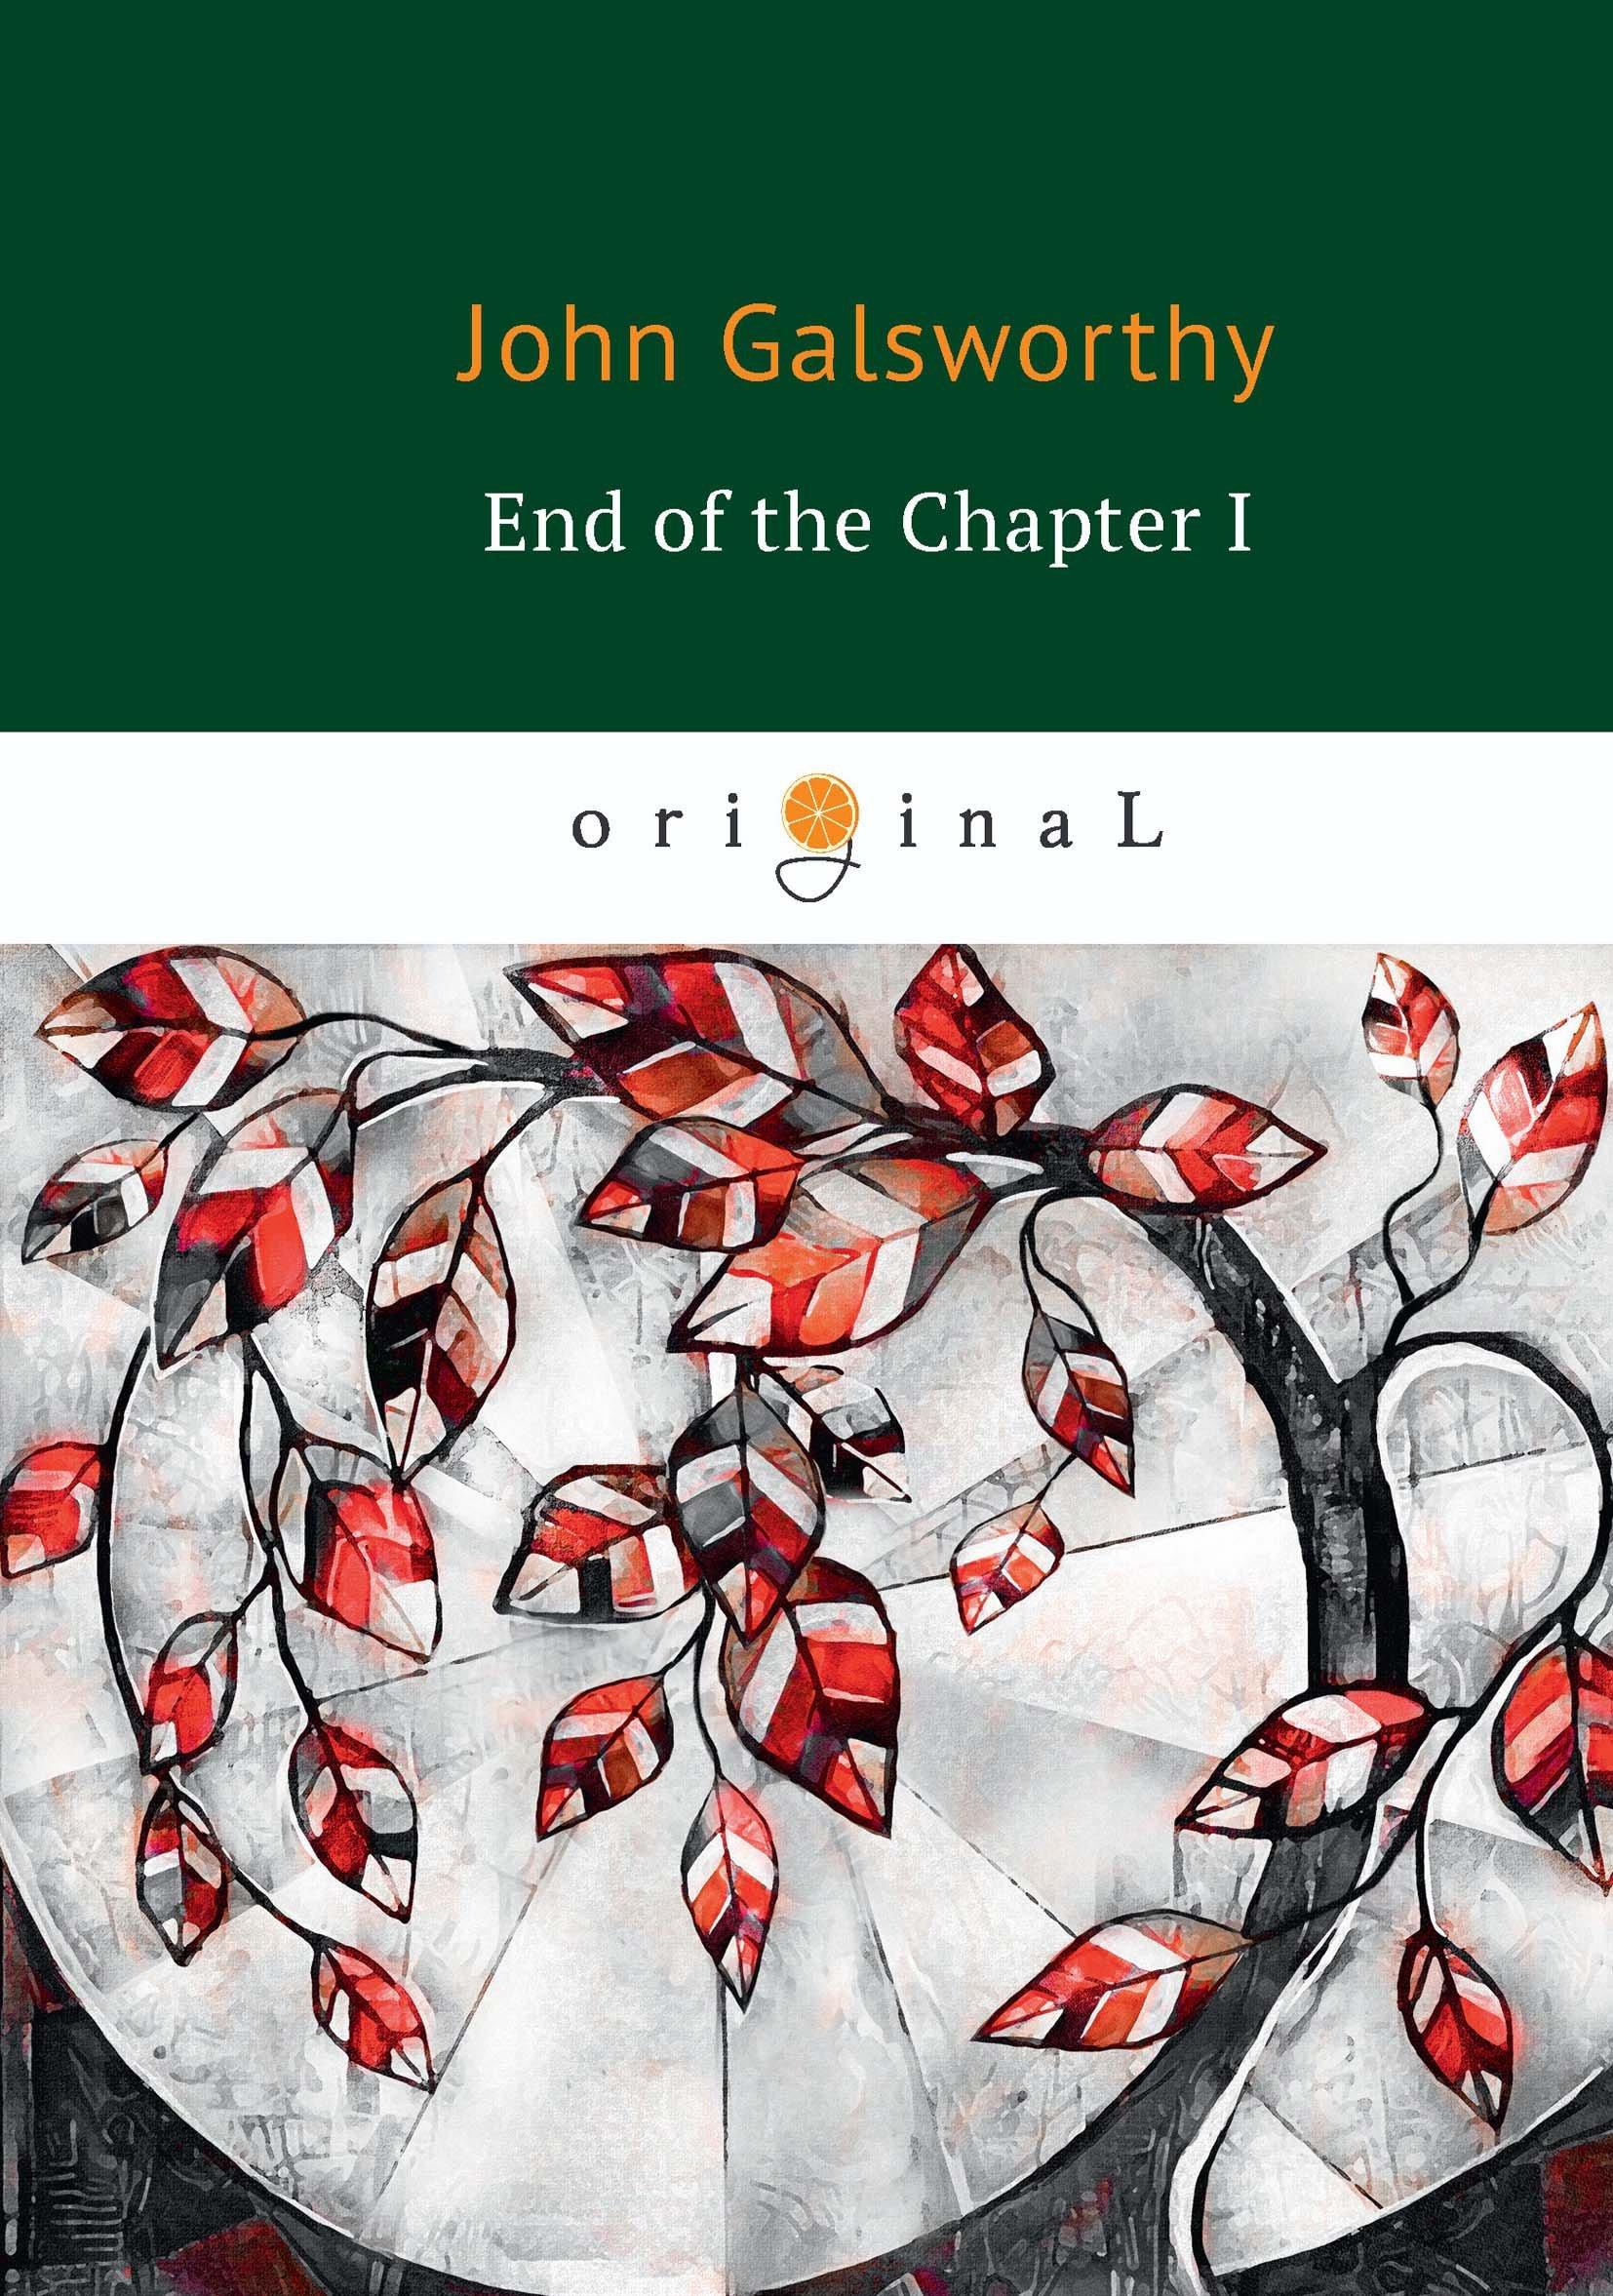 Голсуорси Джон End of the Chapter 1 = Конец главы 1: книга на английском языке galsworthy john end of the chapter i